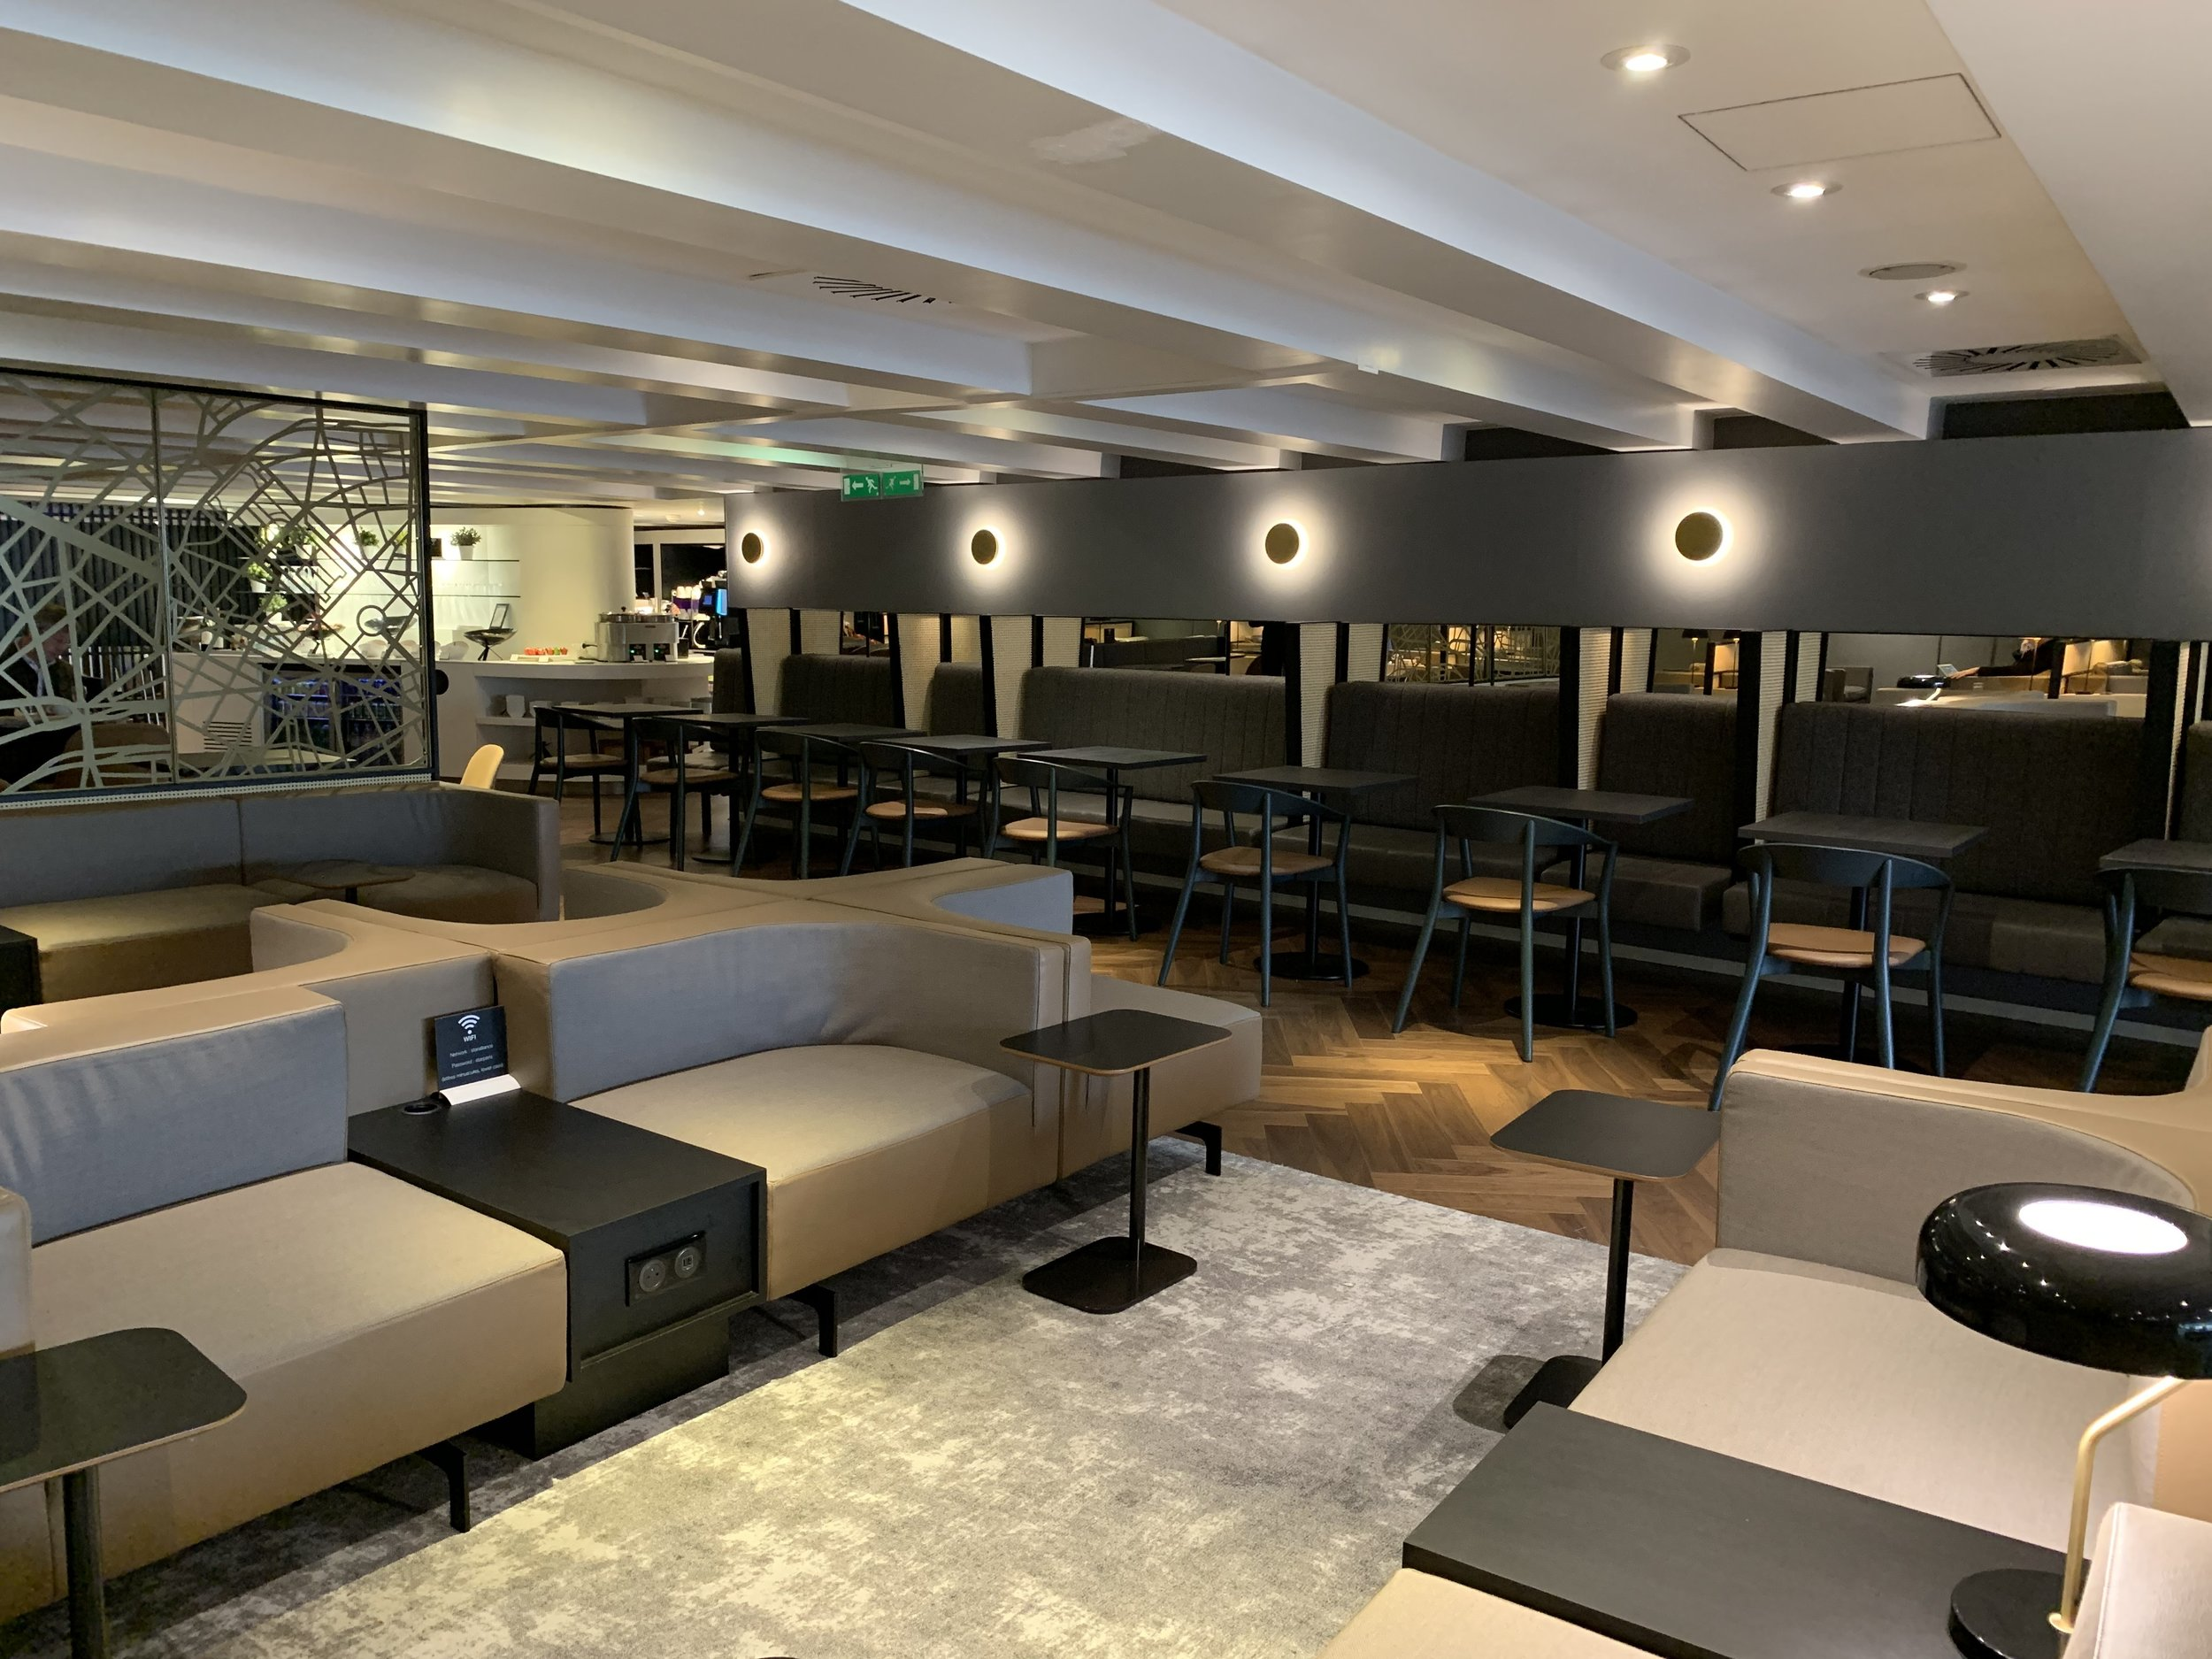 New Refurbished Star Alliance Lounge Paris Charles De Gaulle 3.jpeg